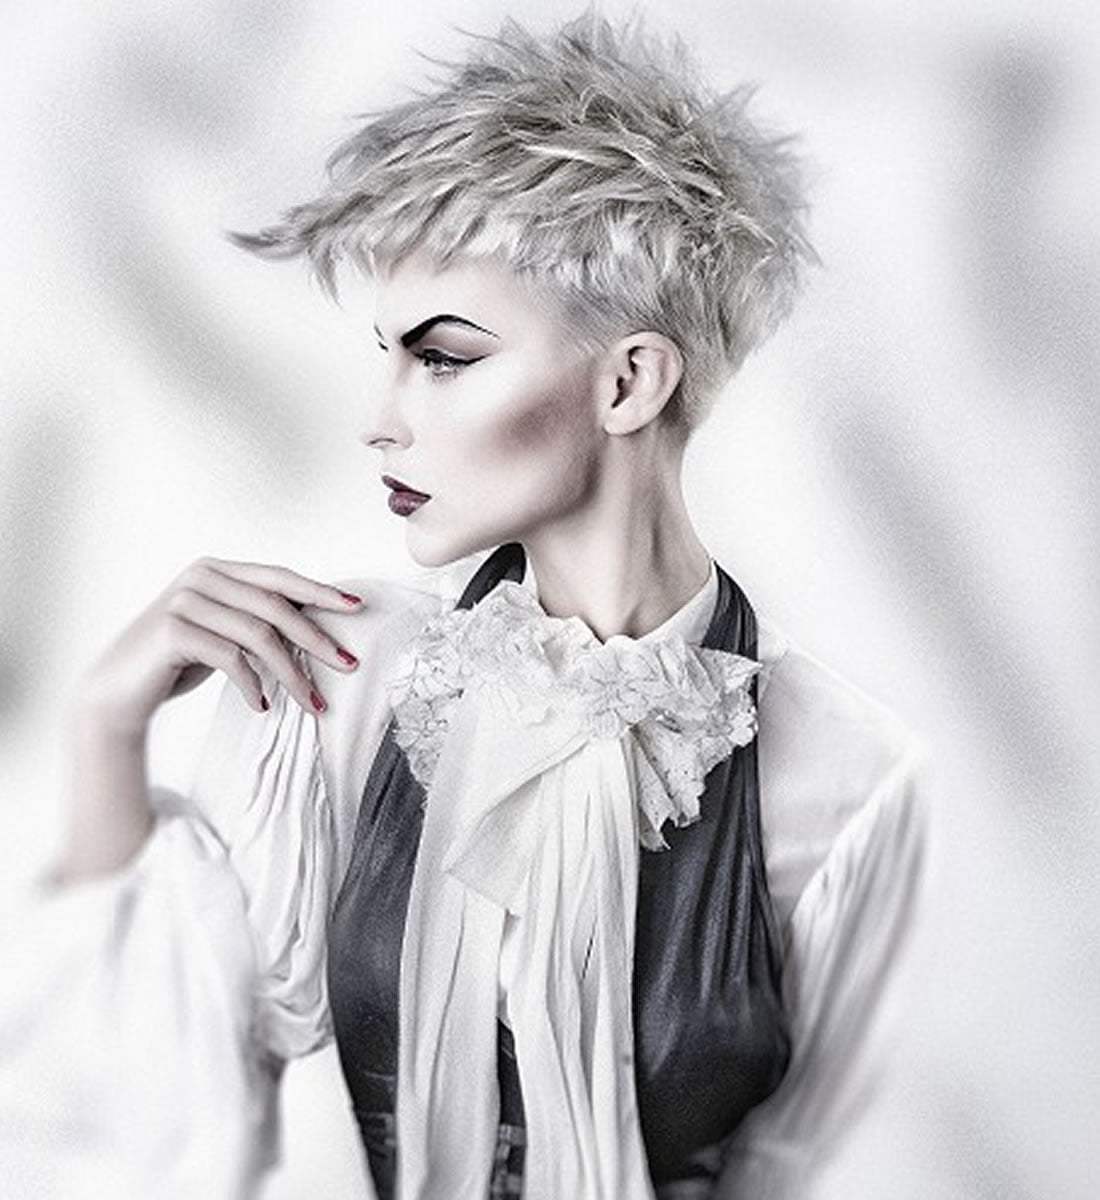 2018 2019: Platinum Blonde Hair Color Ideas For 2018-2019